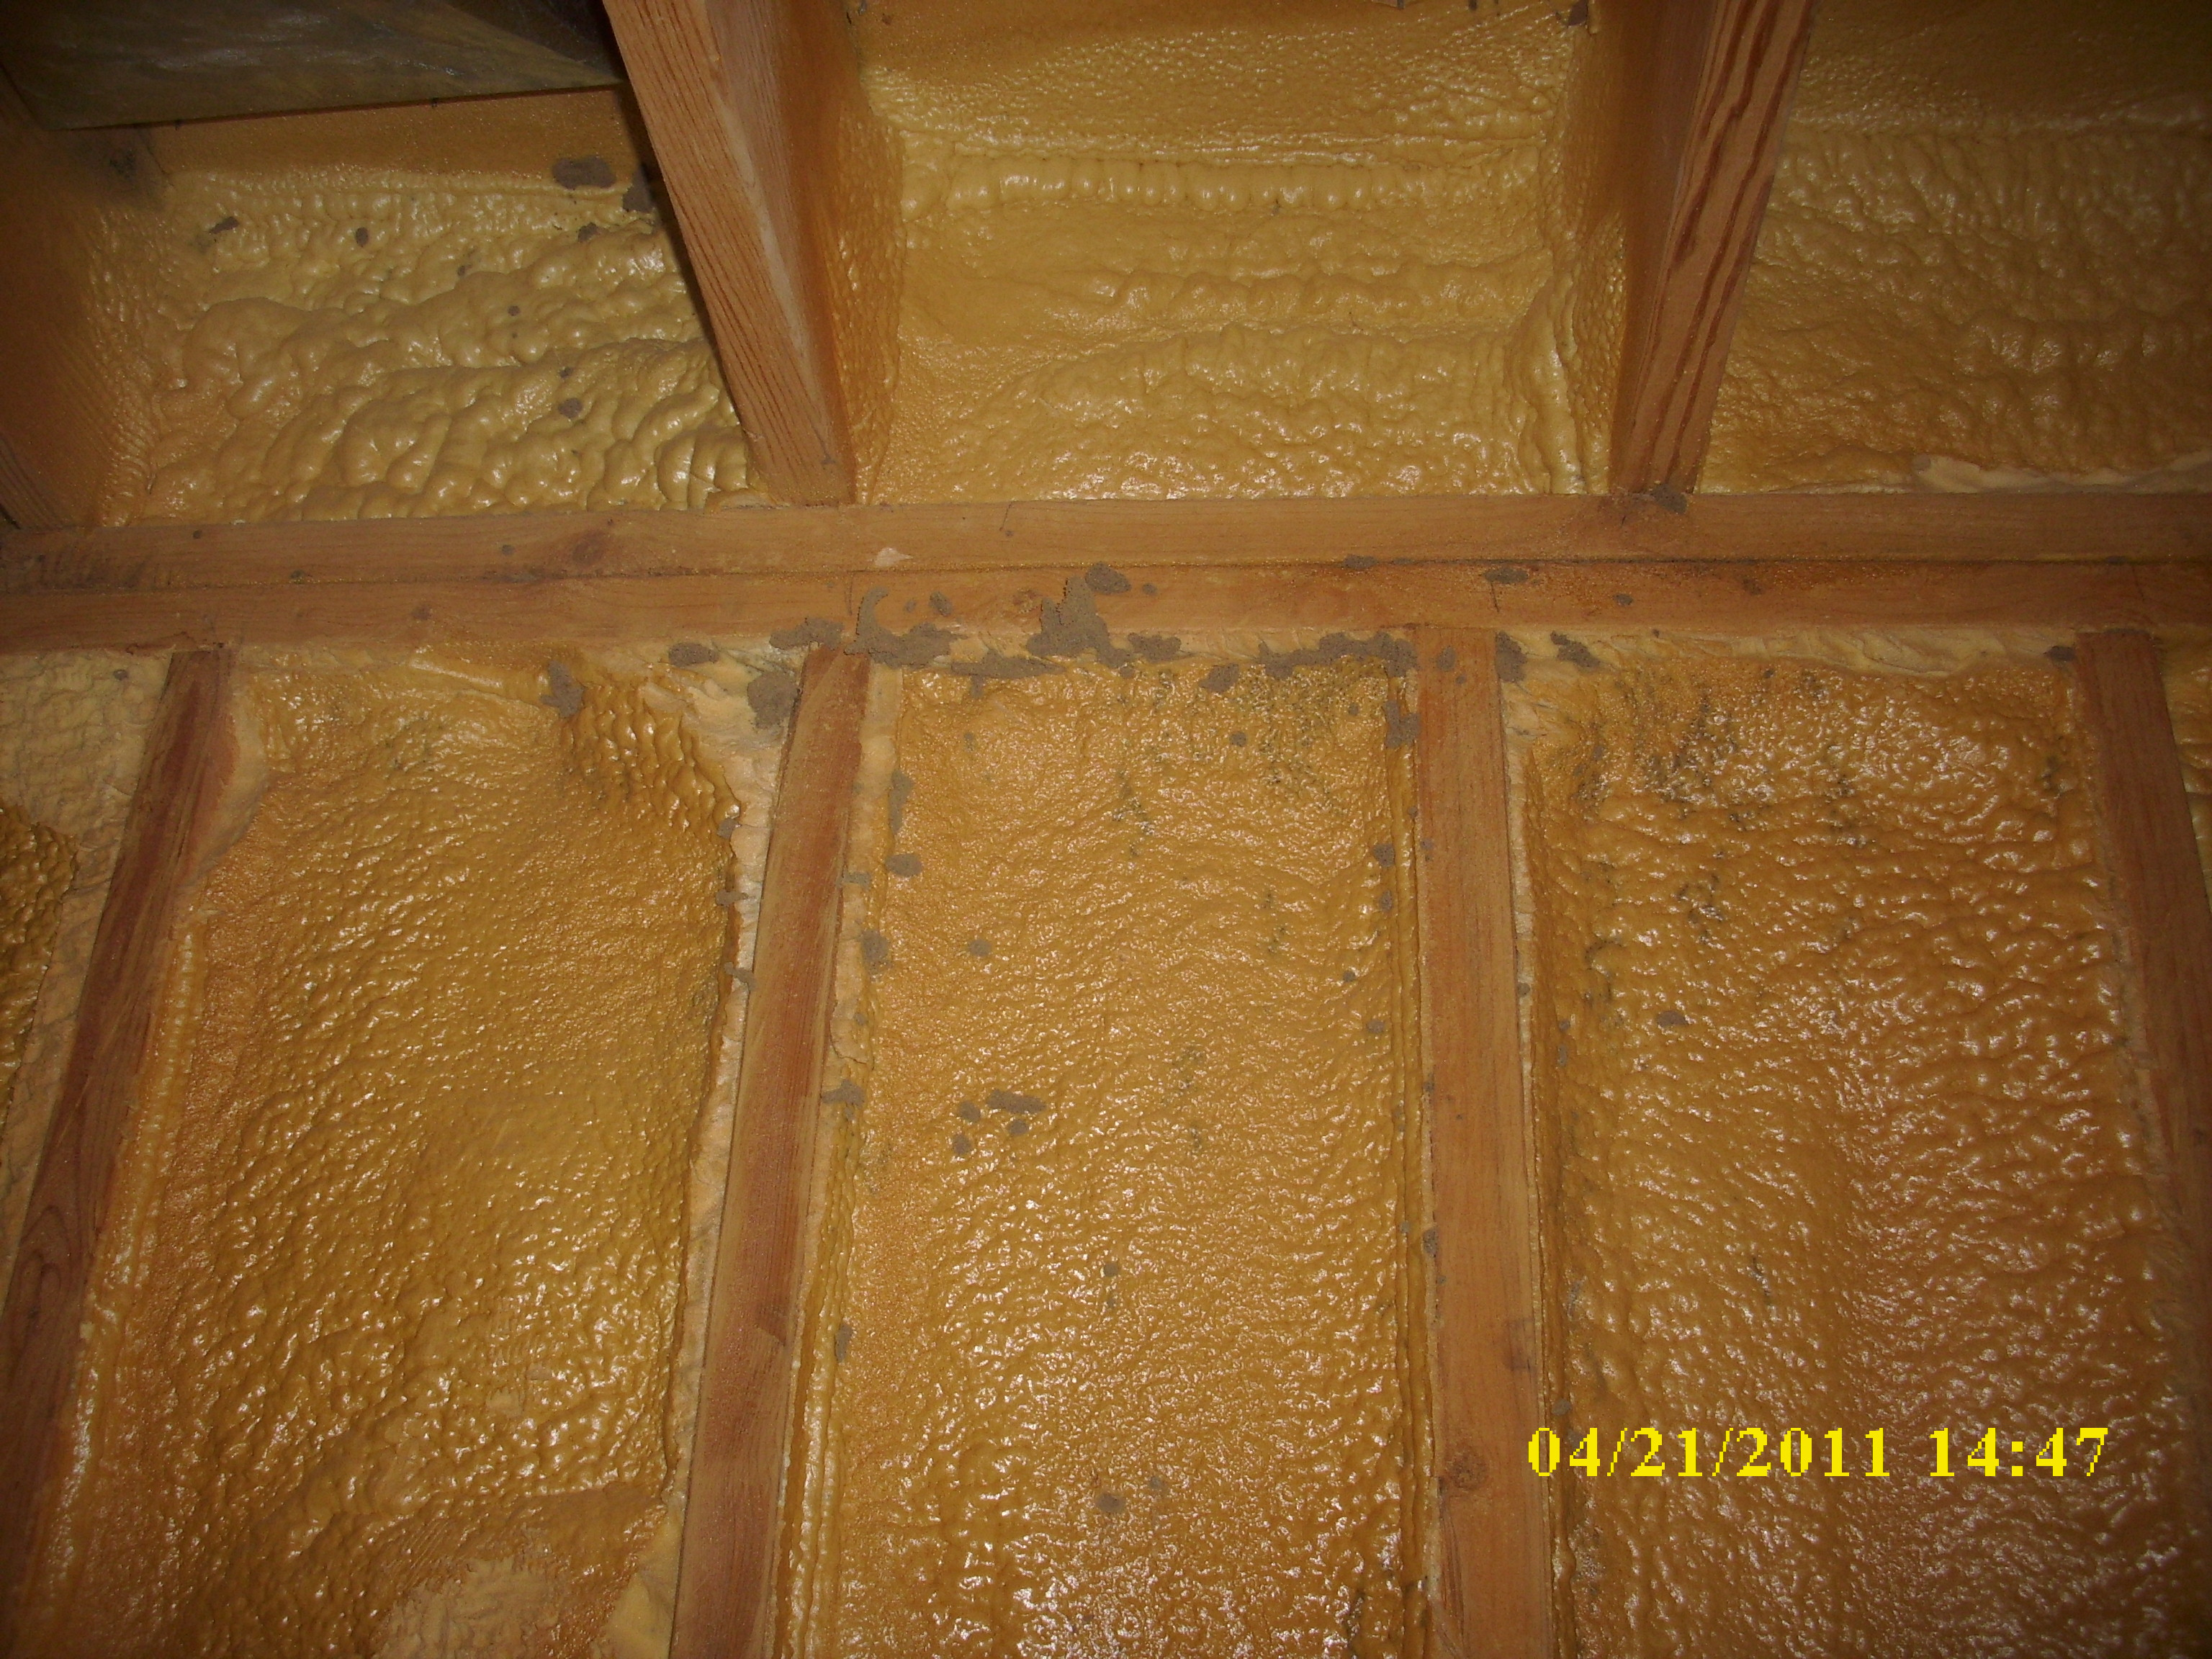 Termites In Foam 001 Swat Team Pest Control Services Of